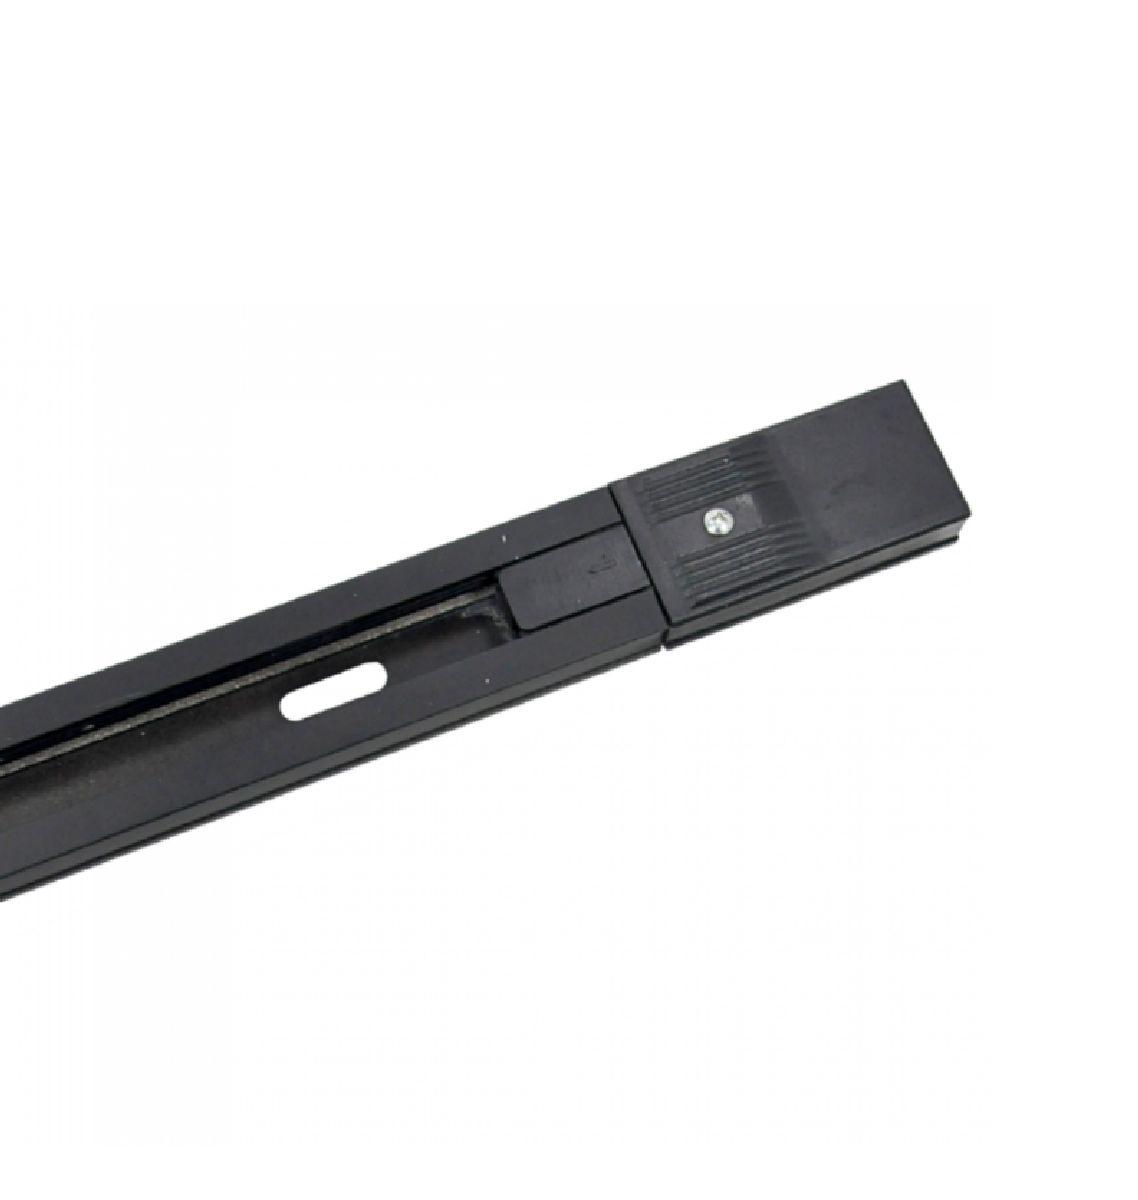 Trilho Eletrificado 1,5m Preto Para Spots Eletrificado Nordecor 6255